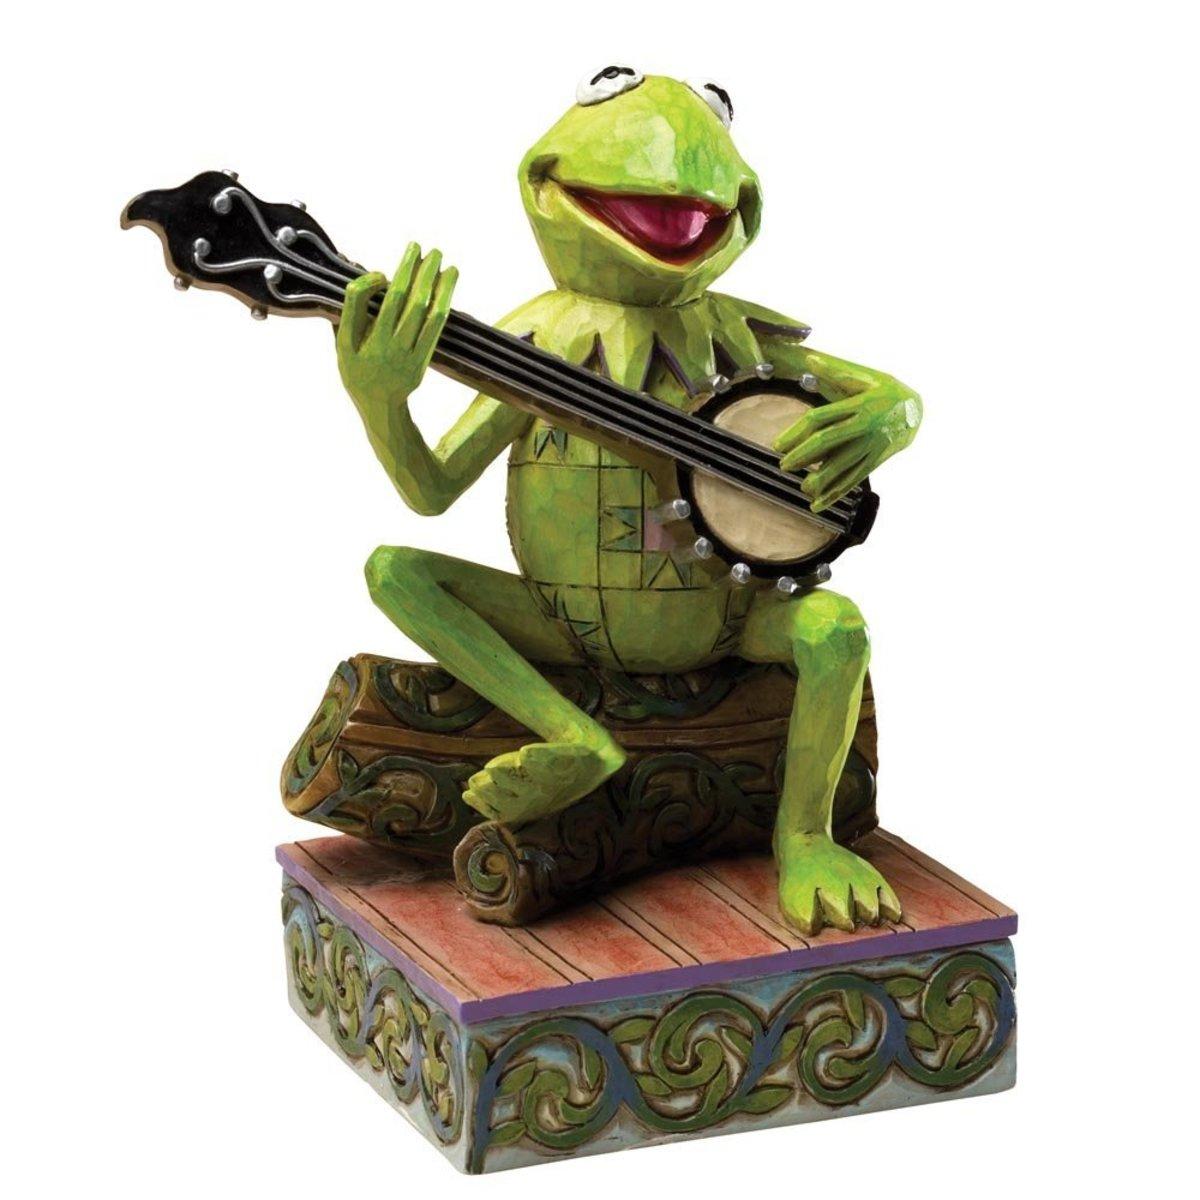 Jim Shore Kermit the Frog Figurine